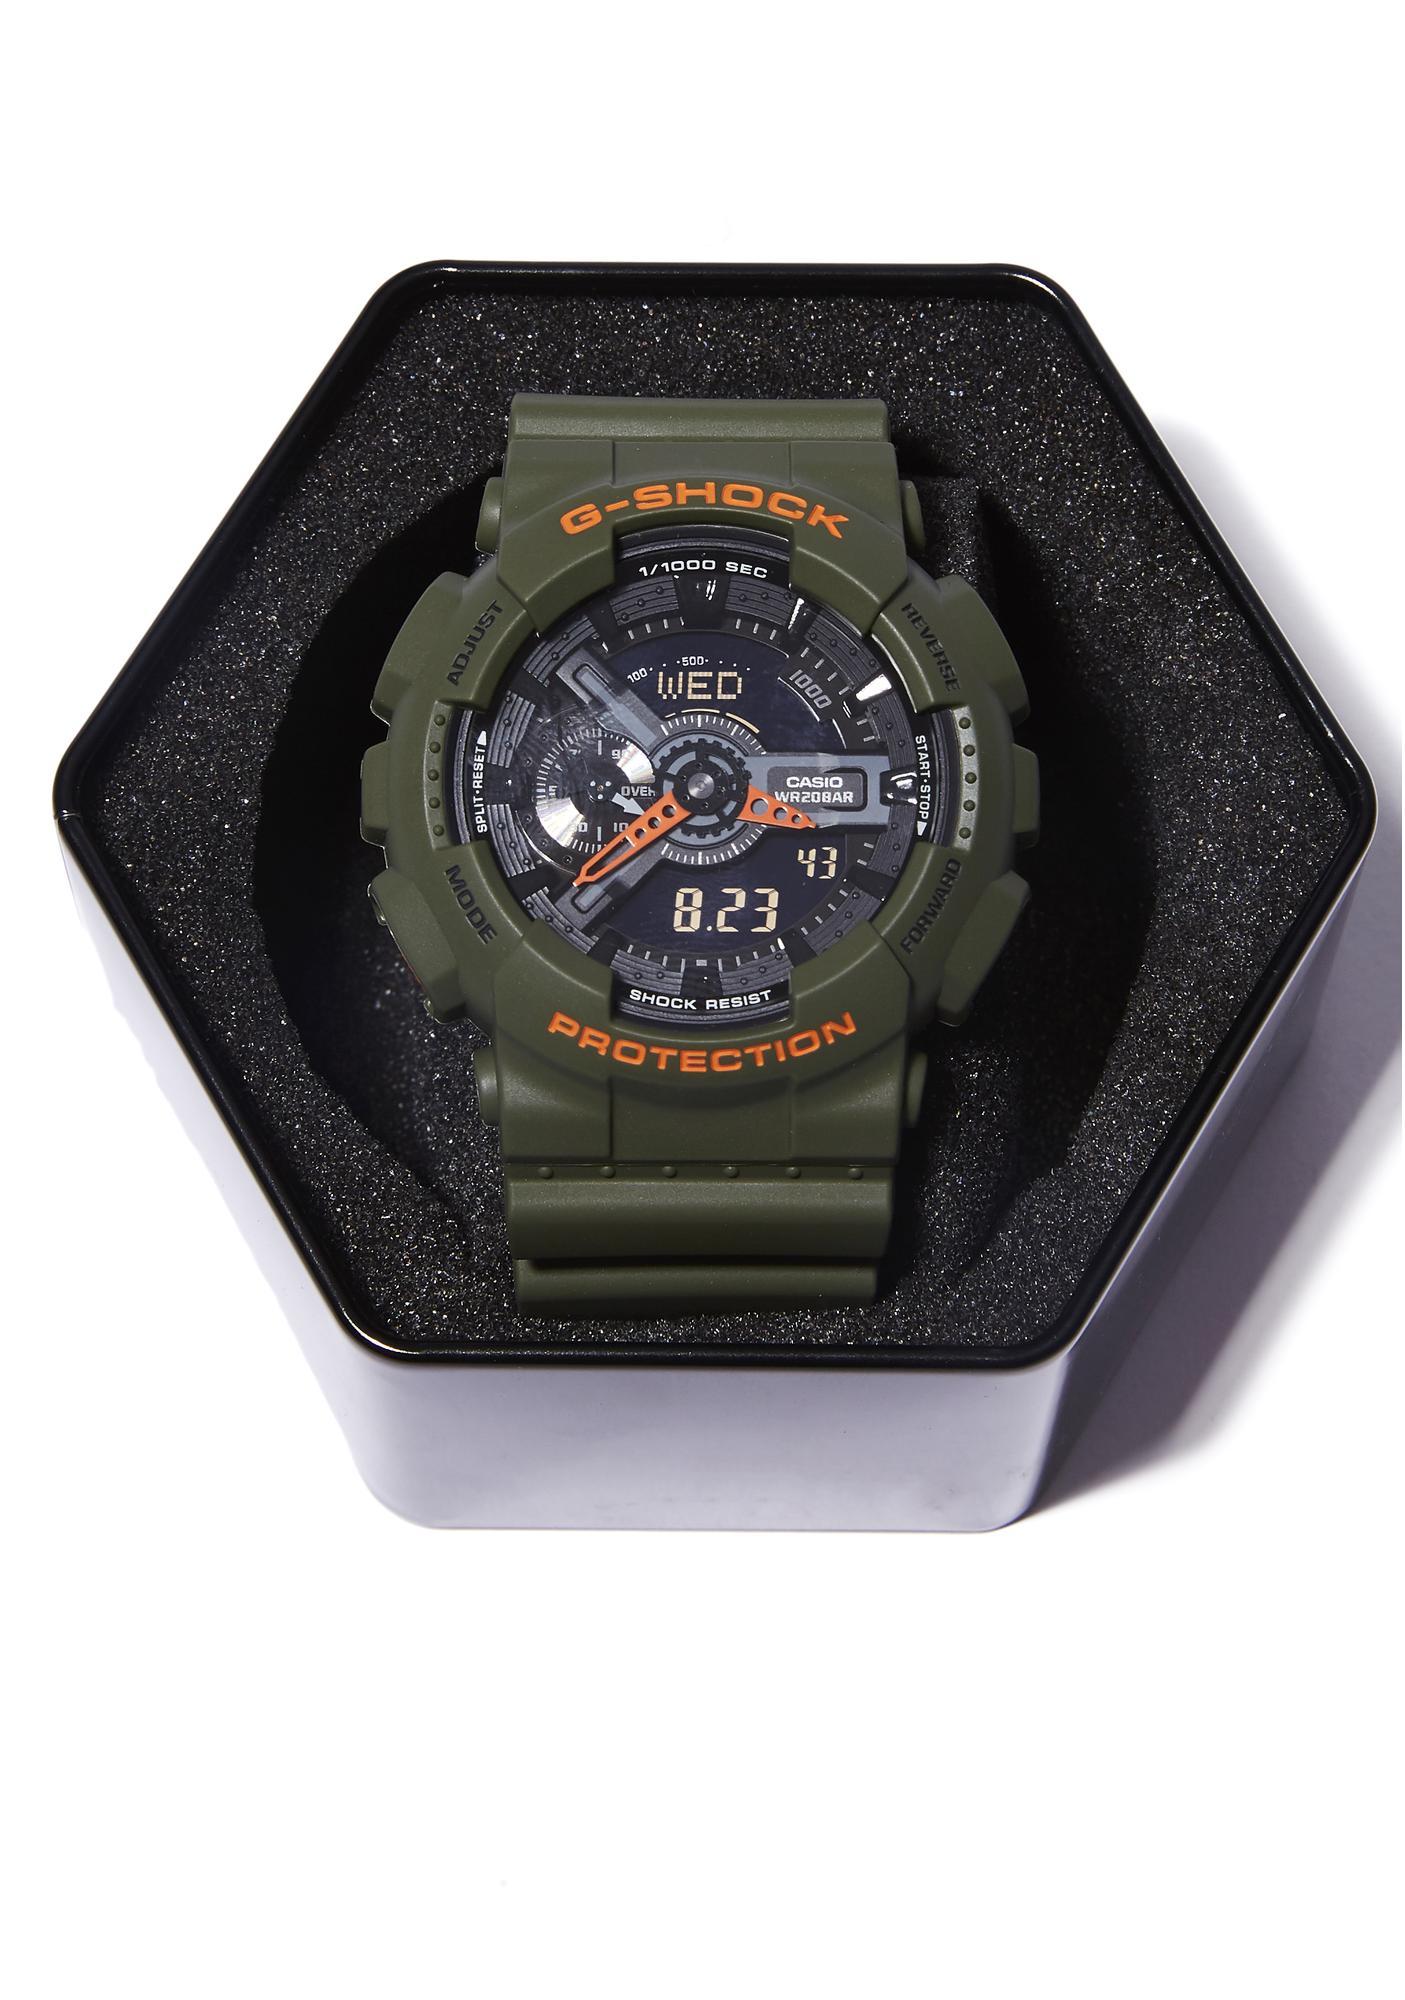 G-Shock Boot Camp GA-110 Series Watch